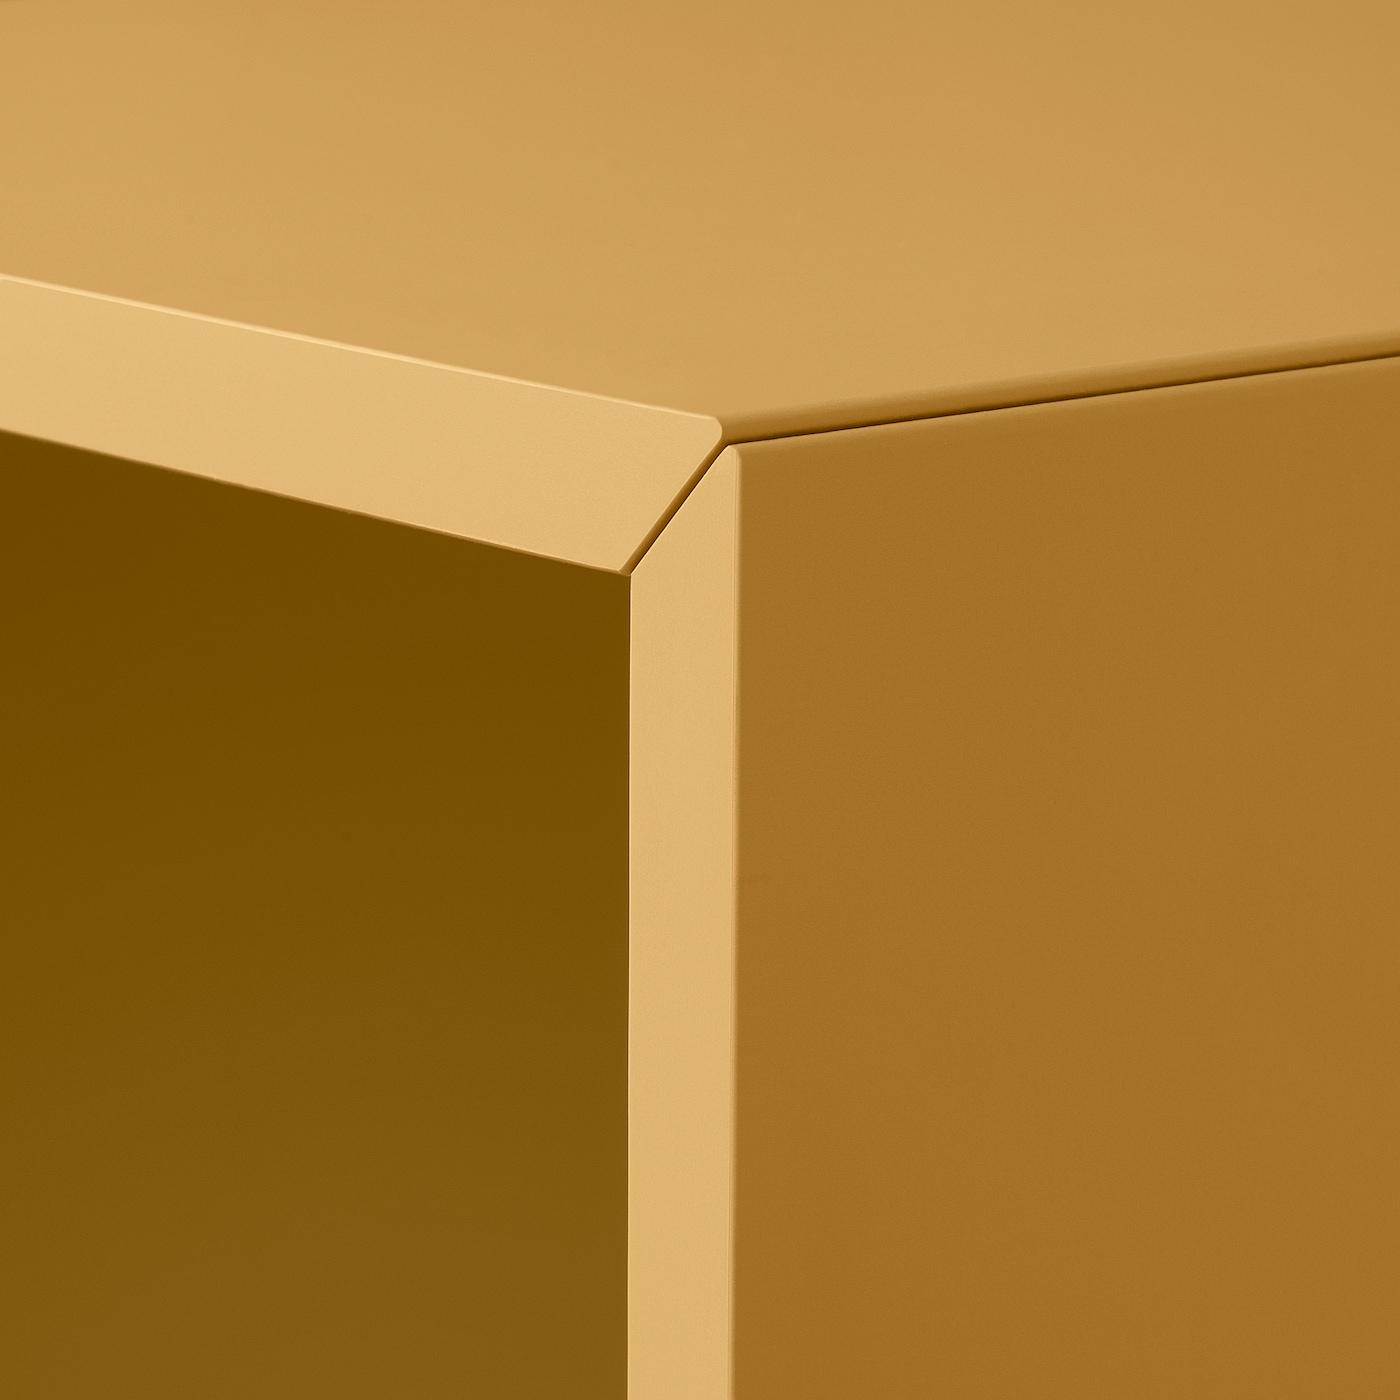 EKET خزانة, ذهبي-يني, 35x25x35 سم